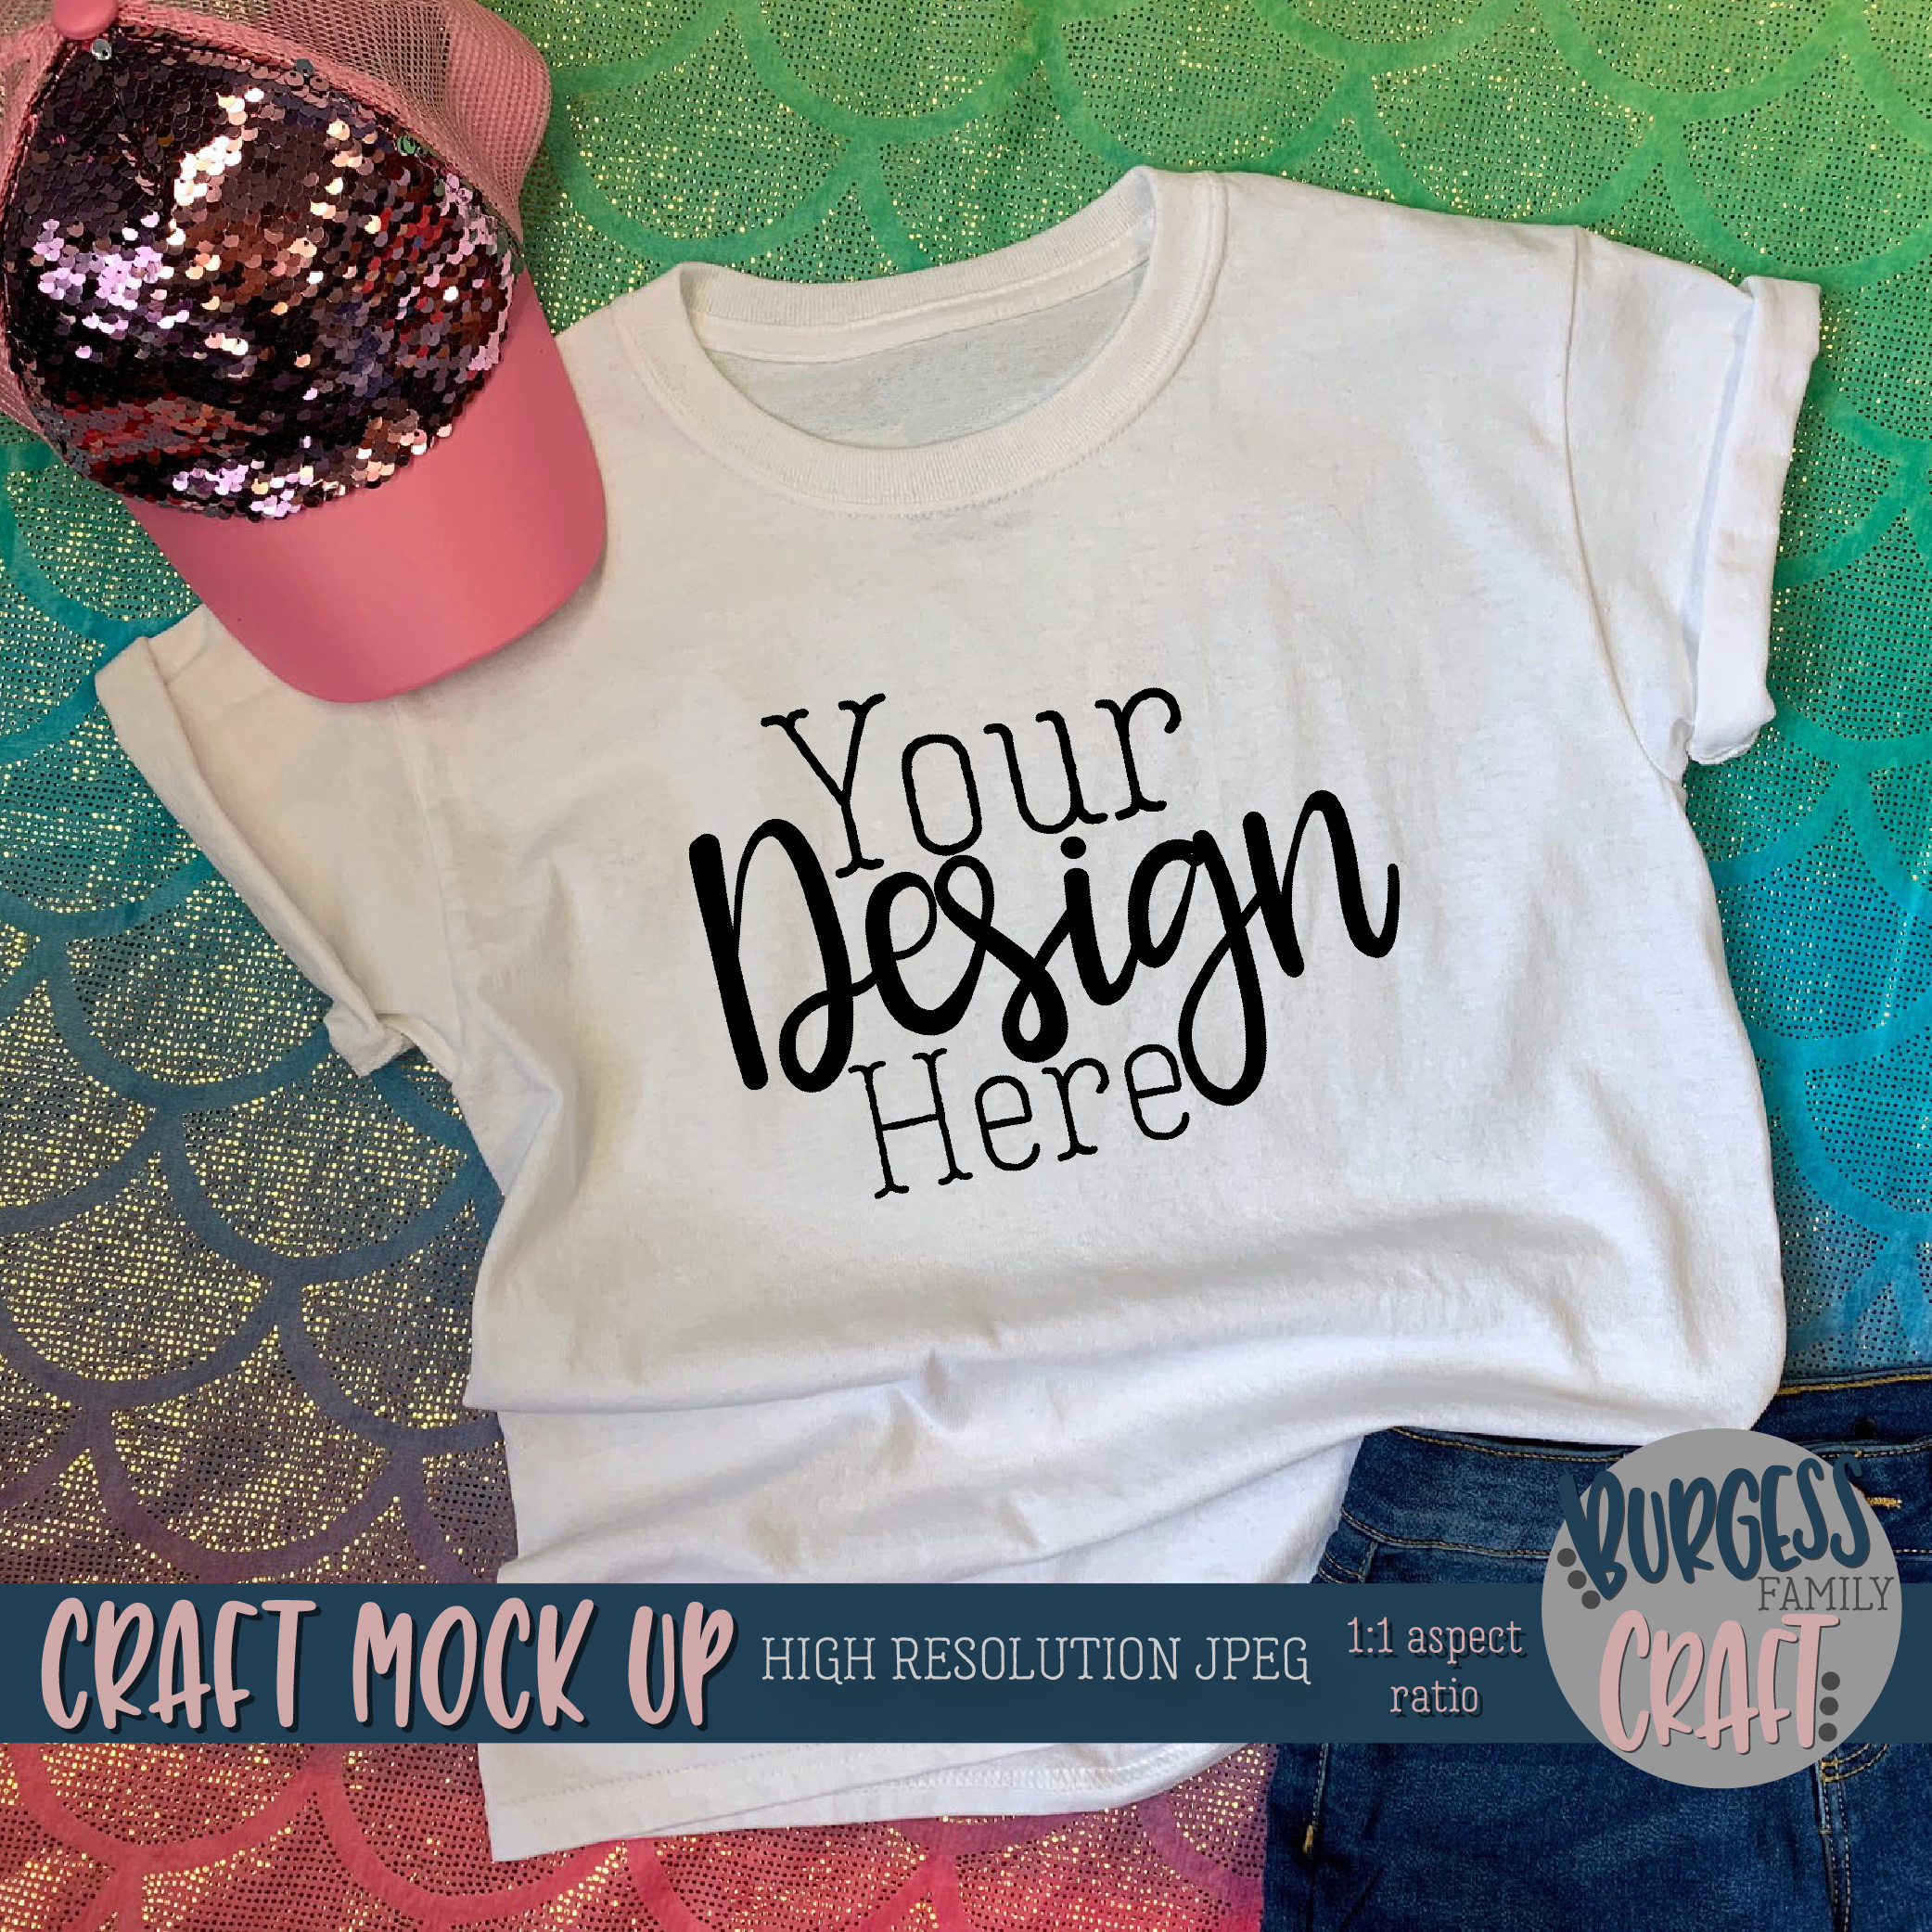 Mermaid shirt Craft mock up | High Resolution JPEG example image 2